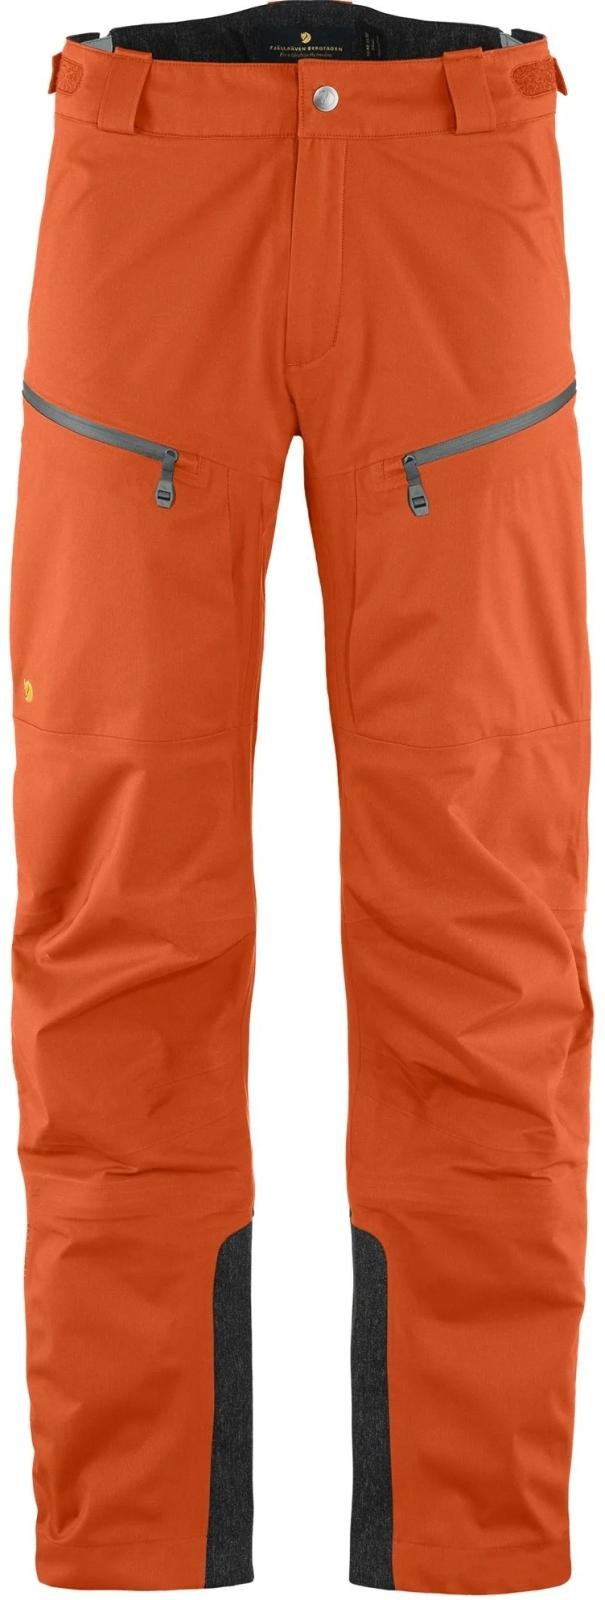 Fjällräven Bergtagen Eco-Shell Trousers M - hokkaido orange L (50)